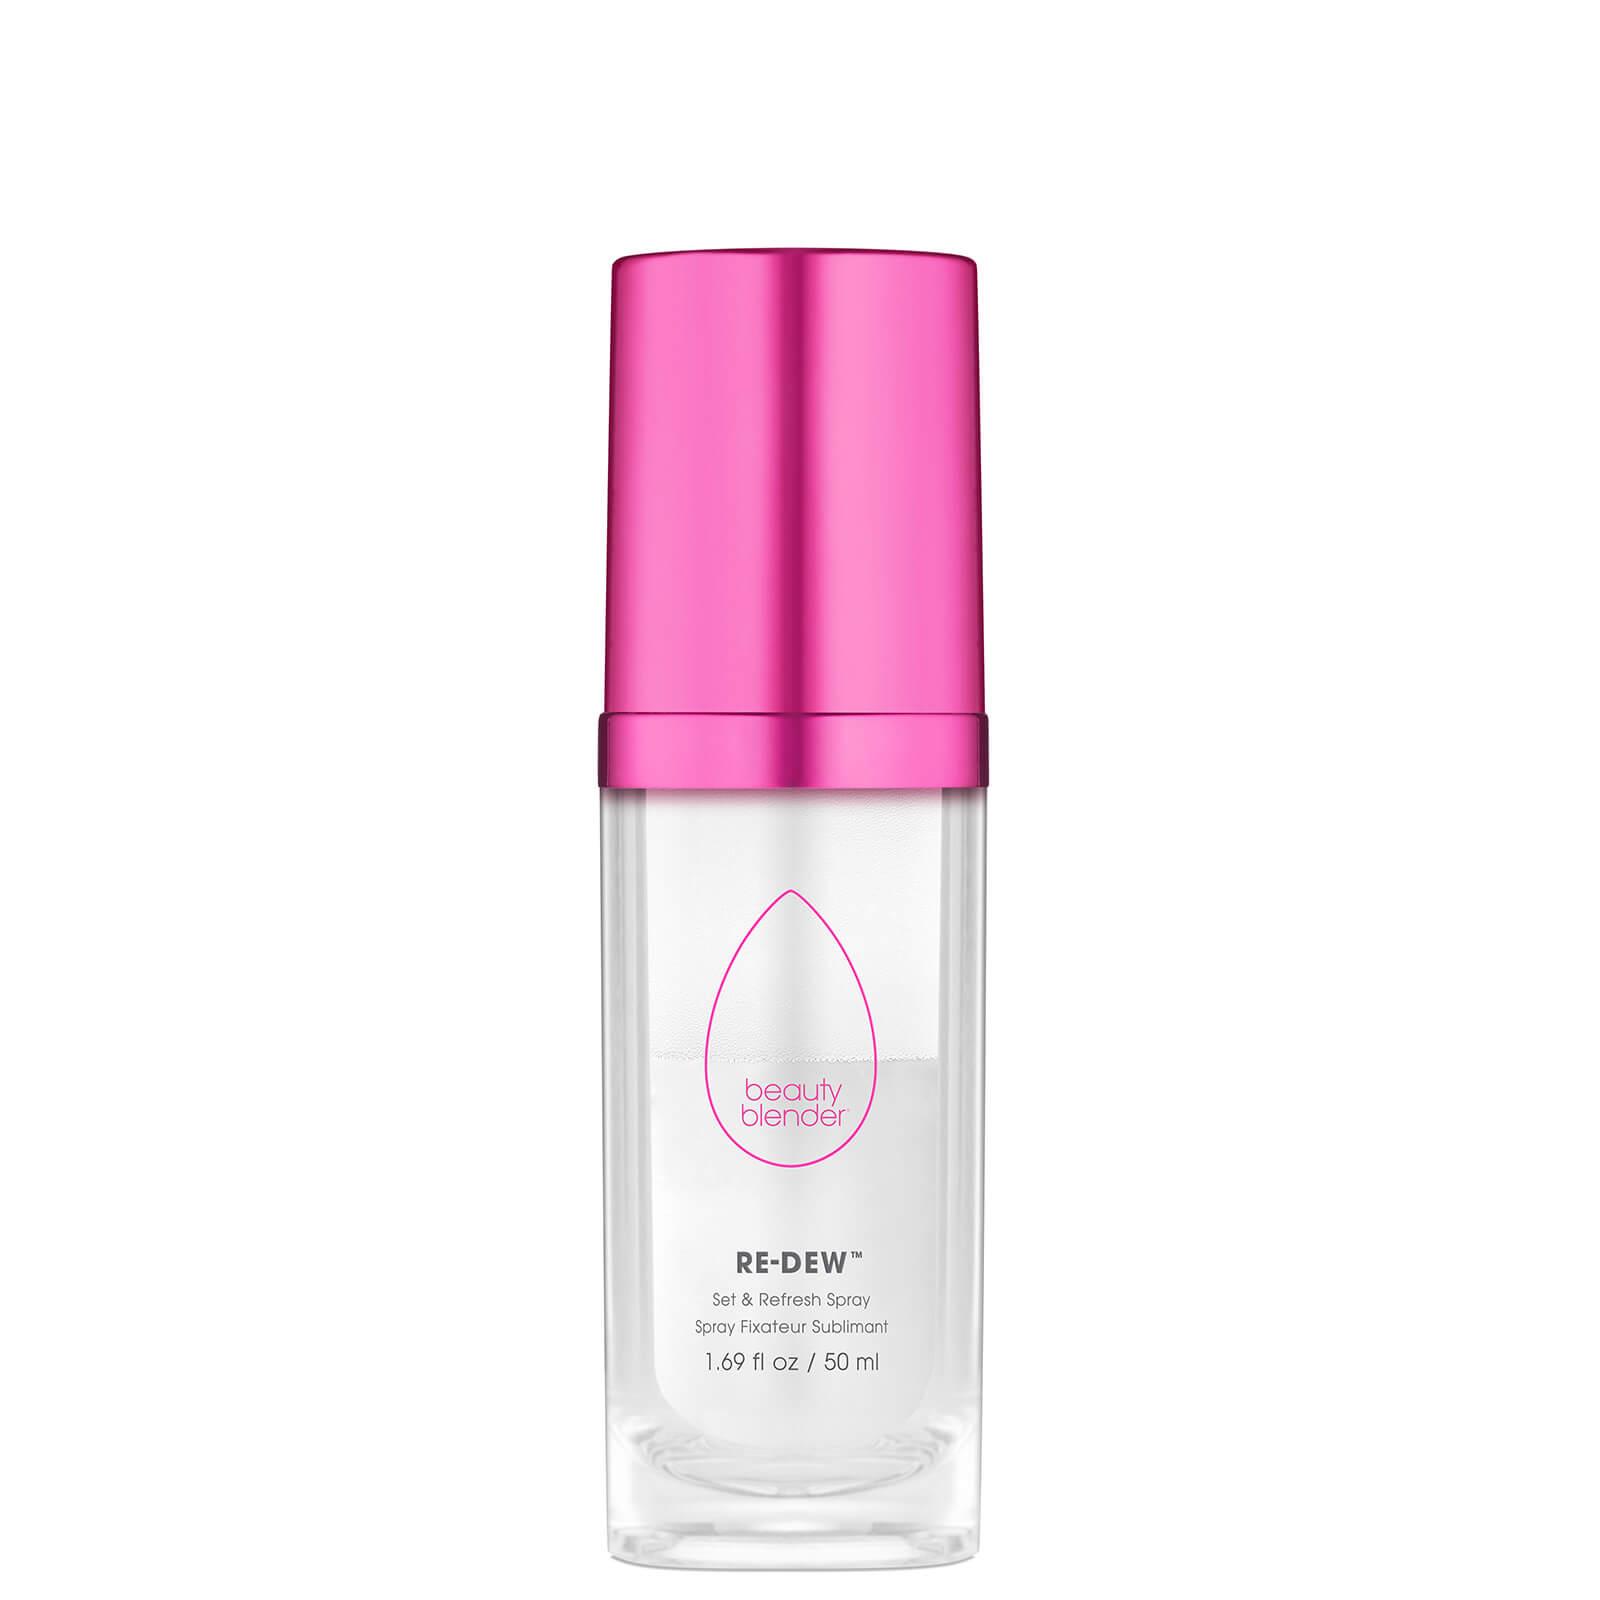 Купить Beautyblender RE-DEW Set and Refresh Spray 50ml